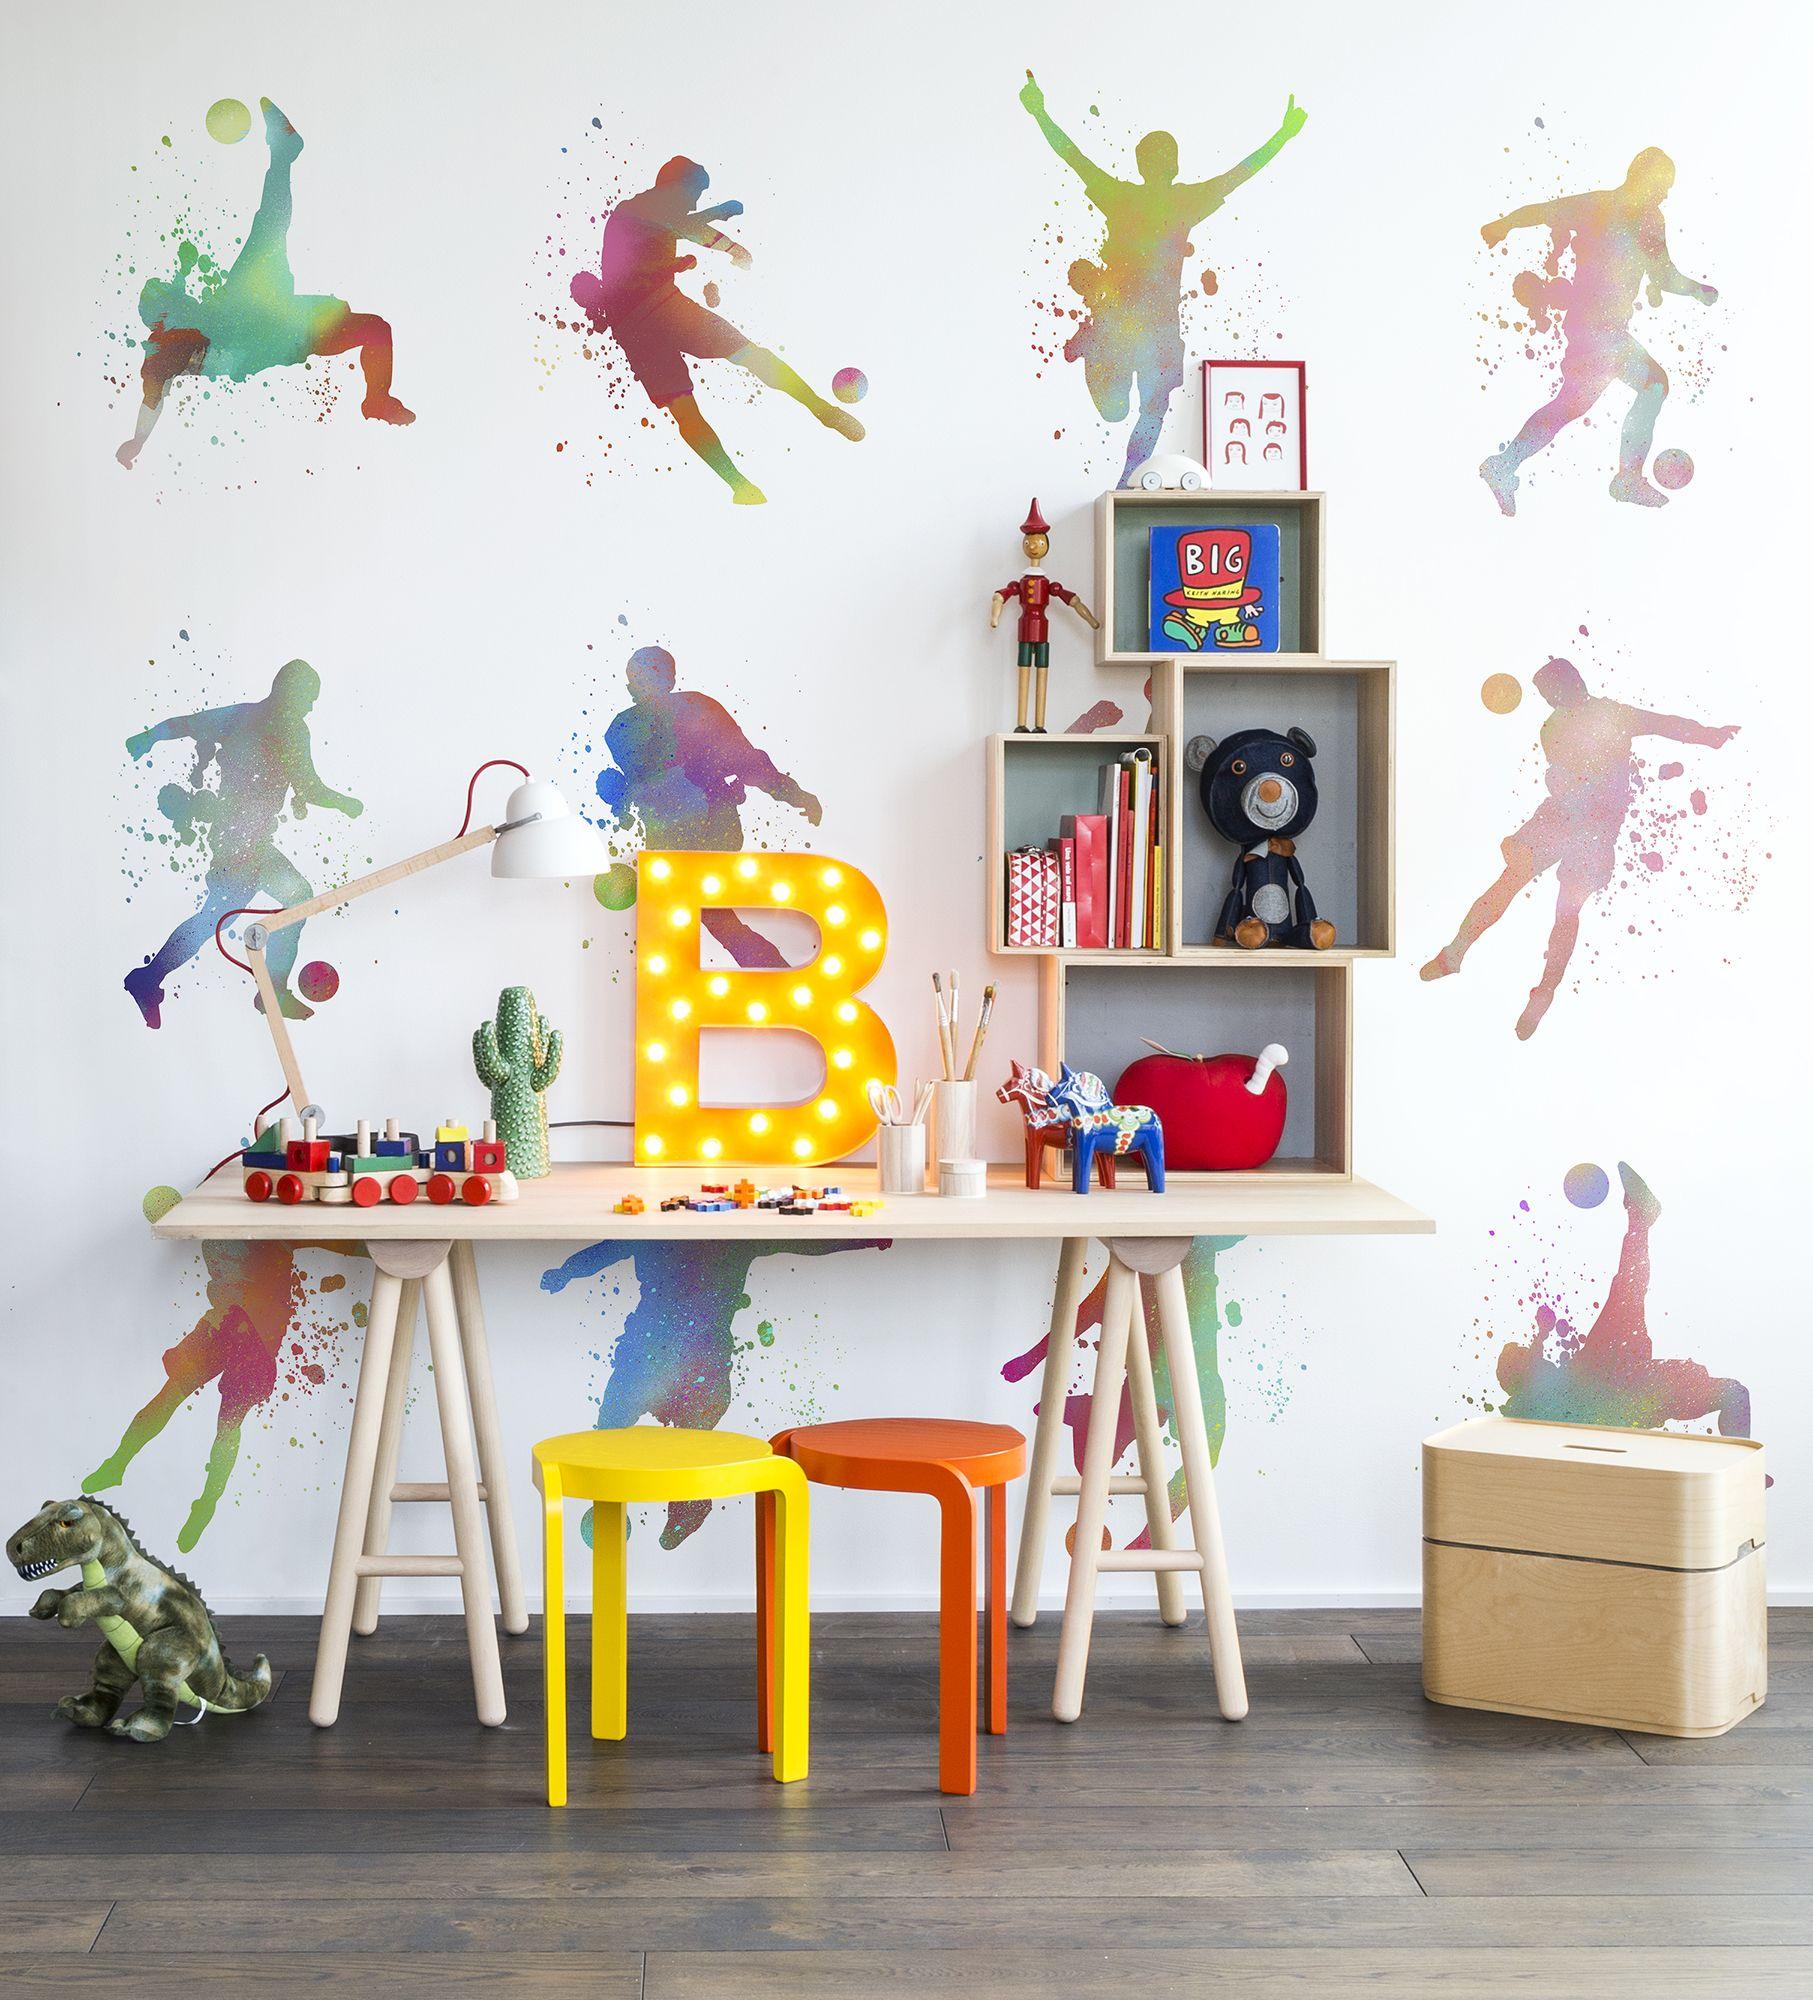 Kinderzimmer wanddekor footboll color  tapeten fürus kinderzimmer  pinterest